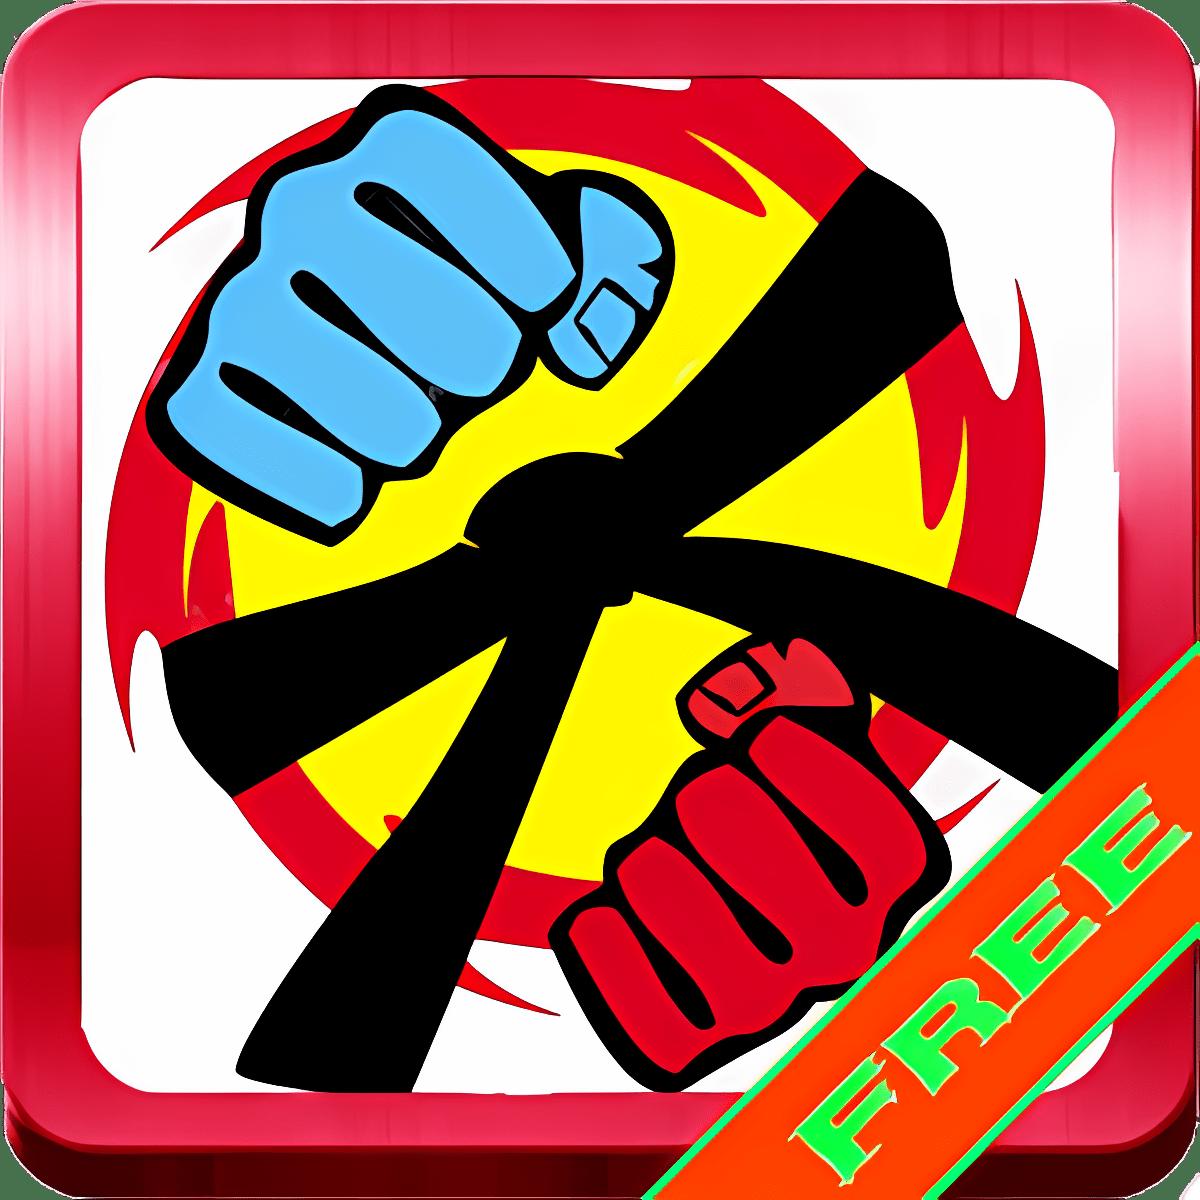 Lucha Arte Karate Sonidos